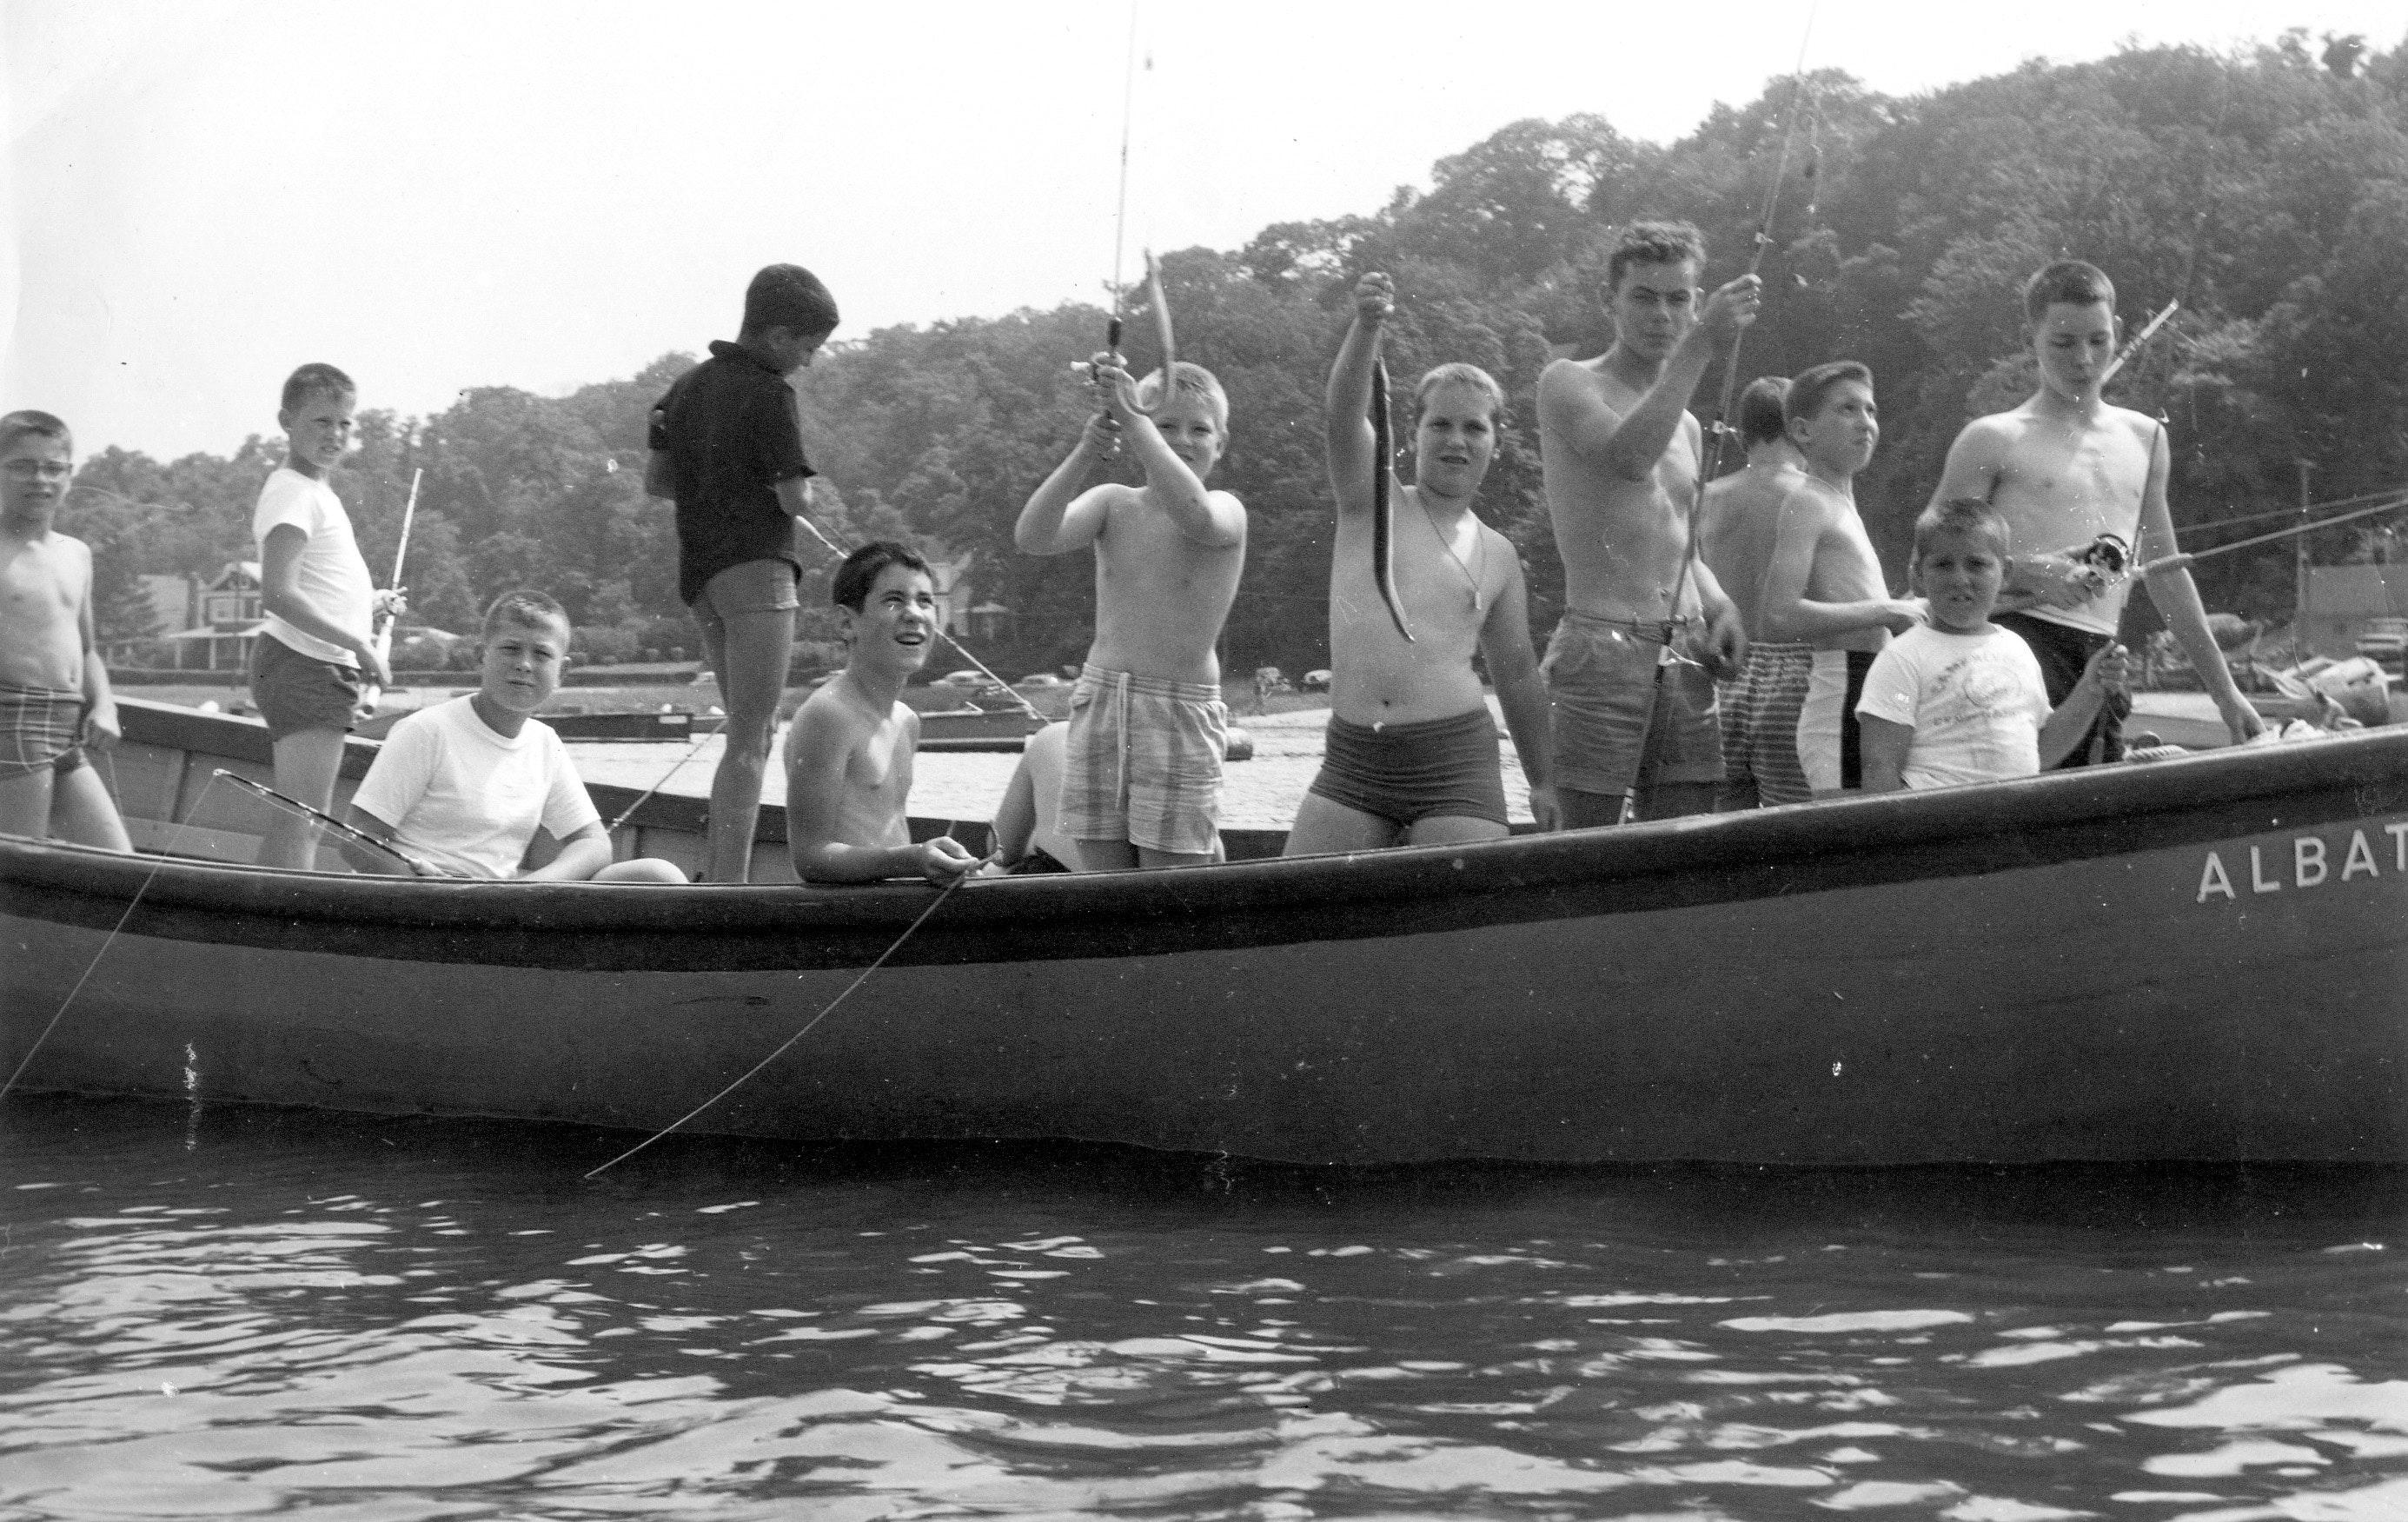 Camp history at alvernia day camp in new york.jpg?ixlib=rails 2.1